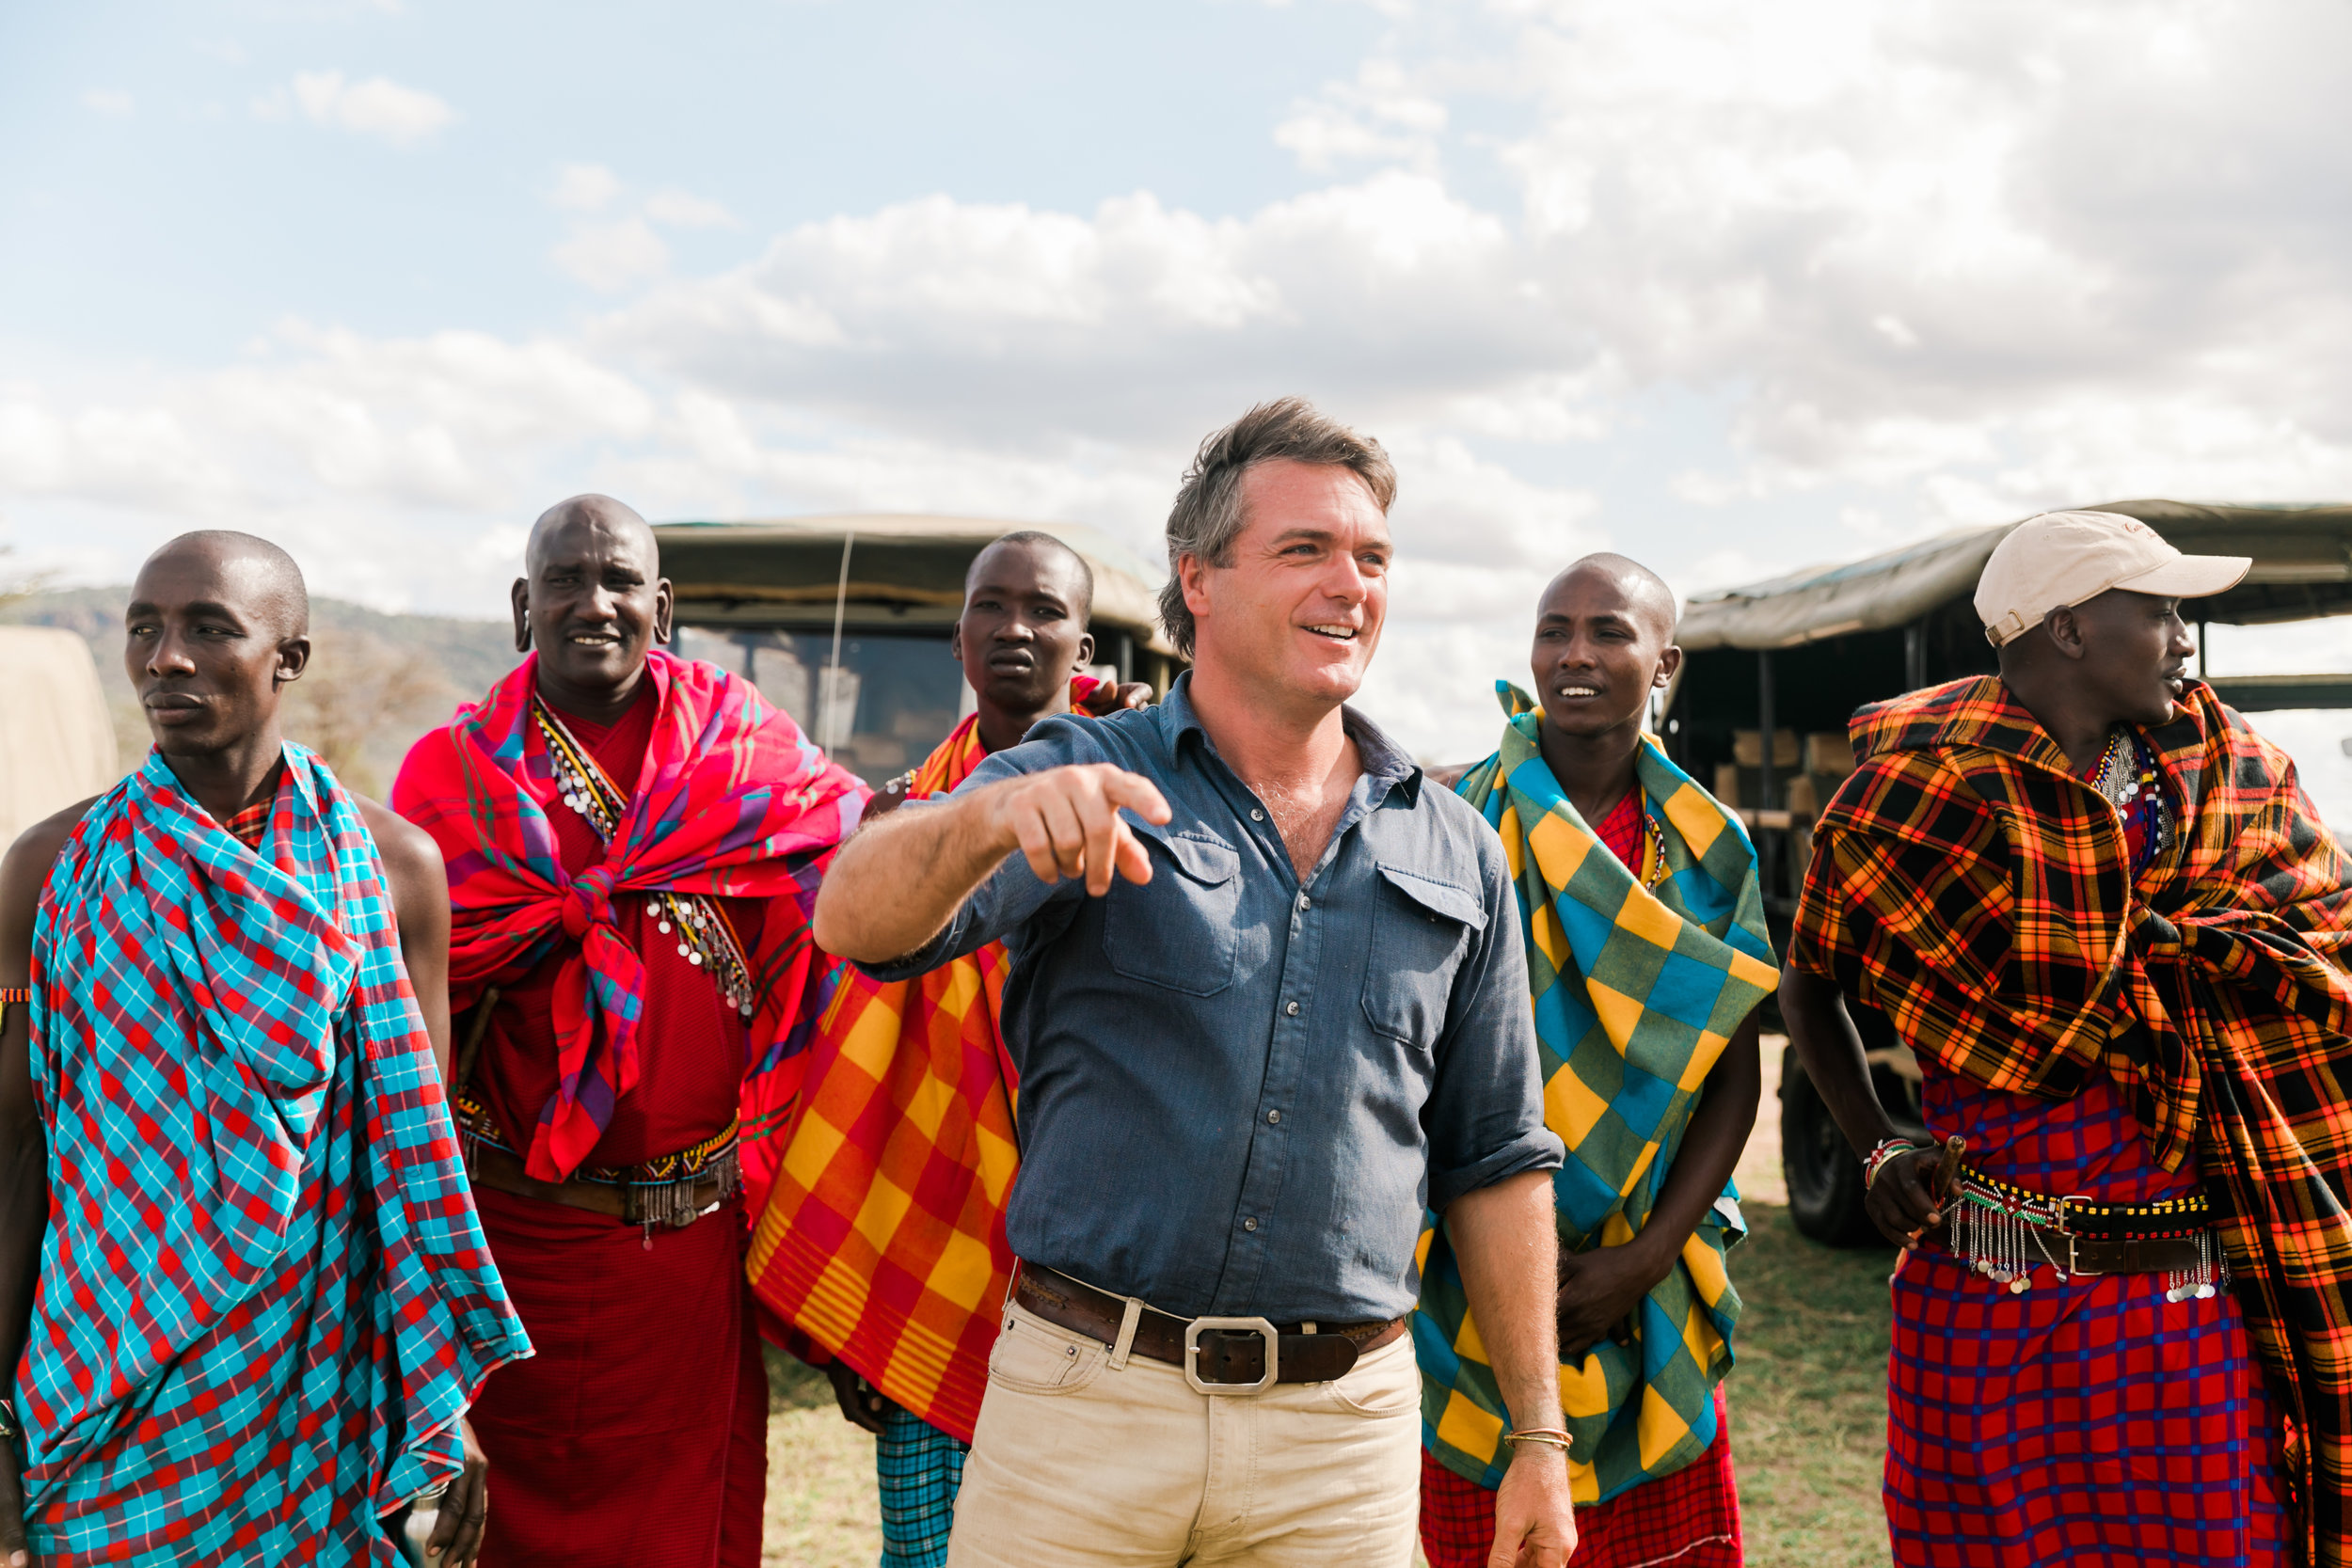 Maasai Greeting upon Arrival in Kenya Ph. Valorie Darling